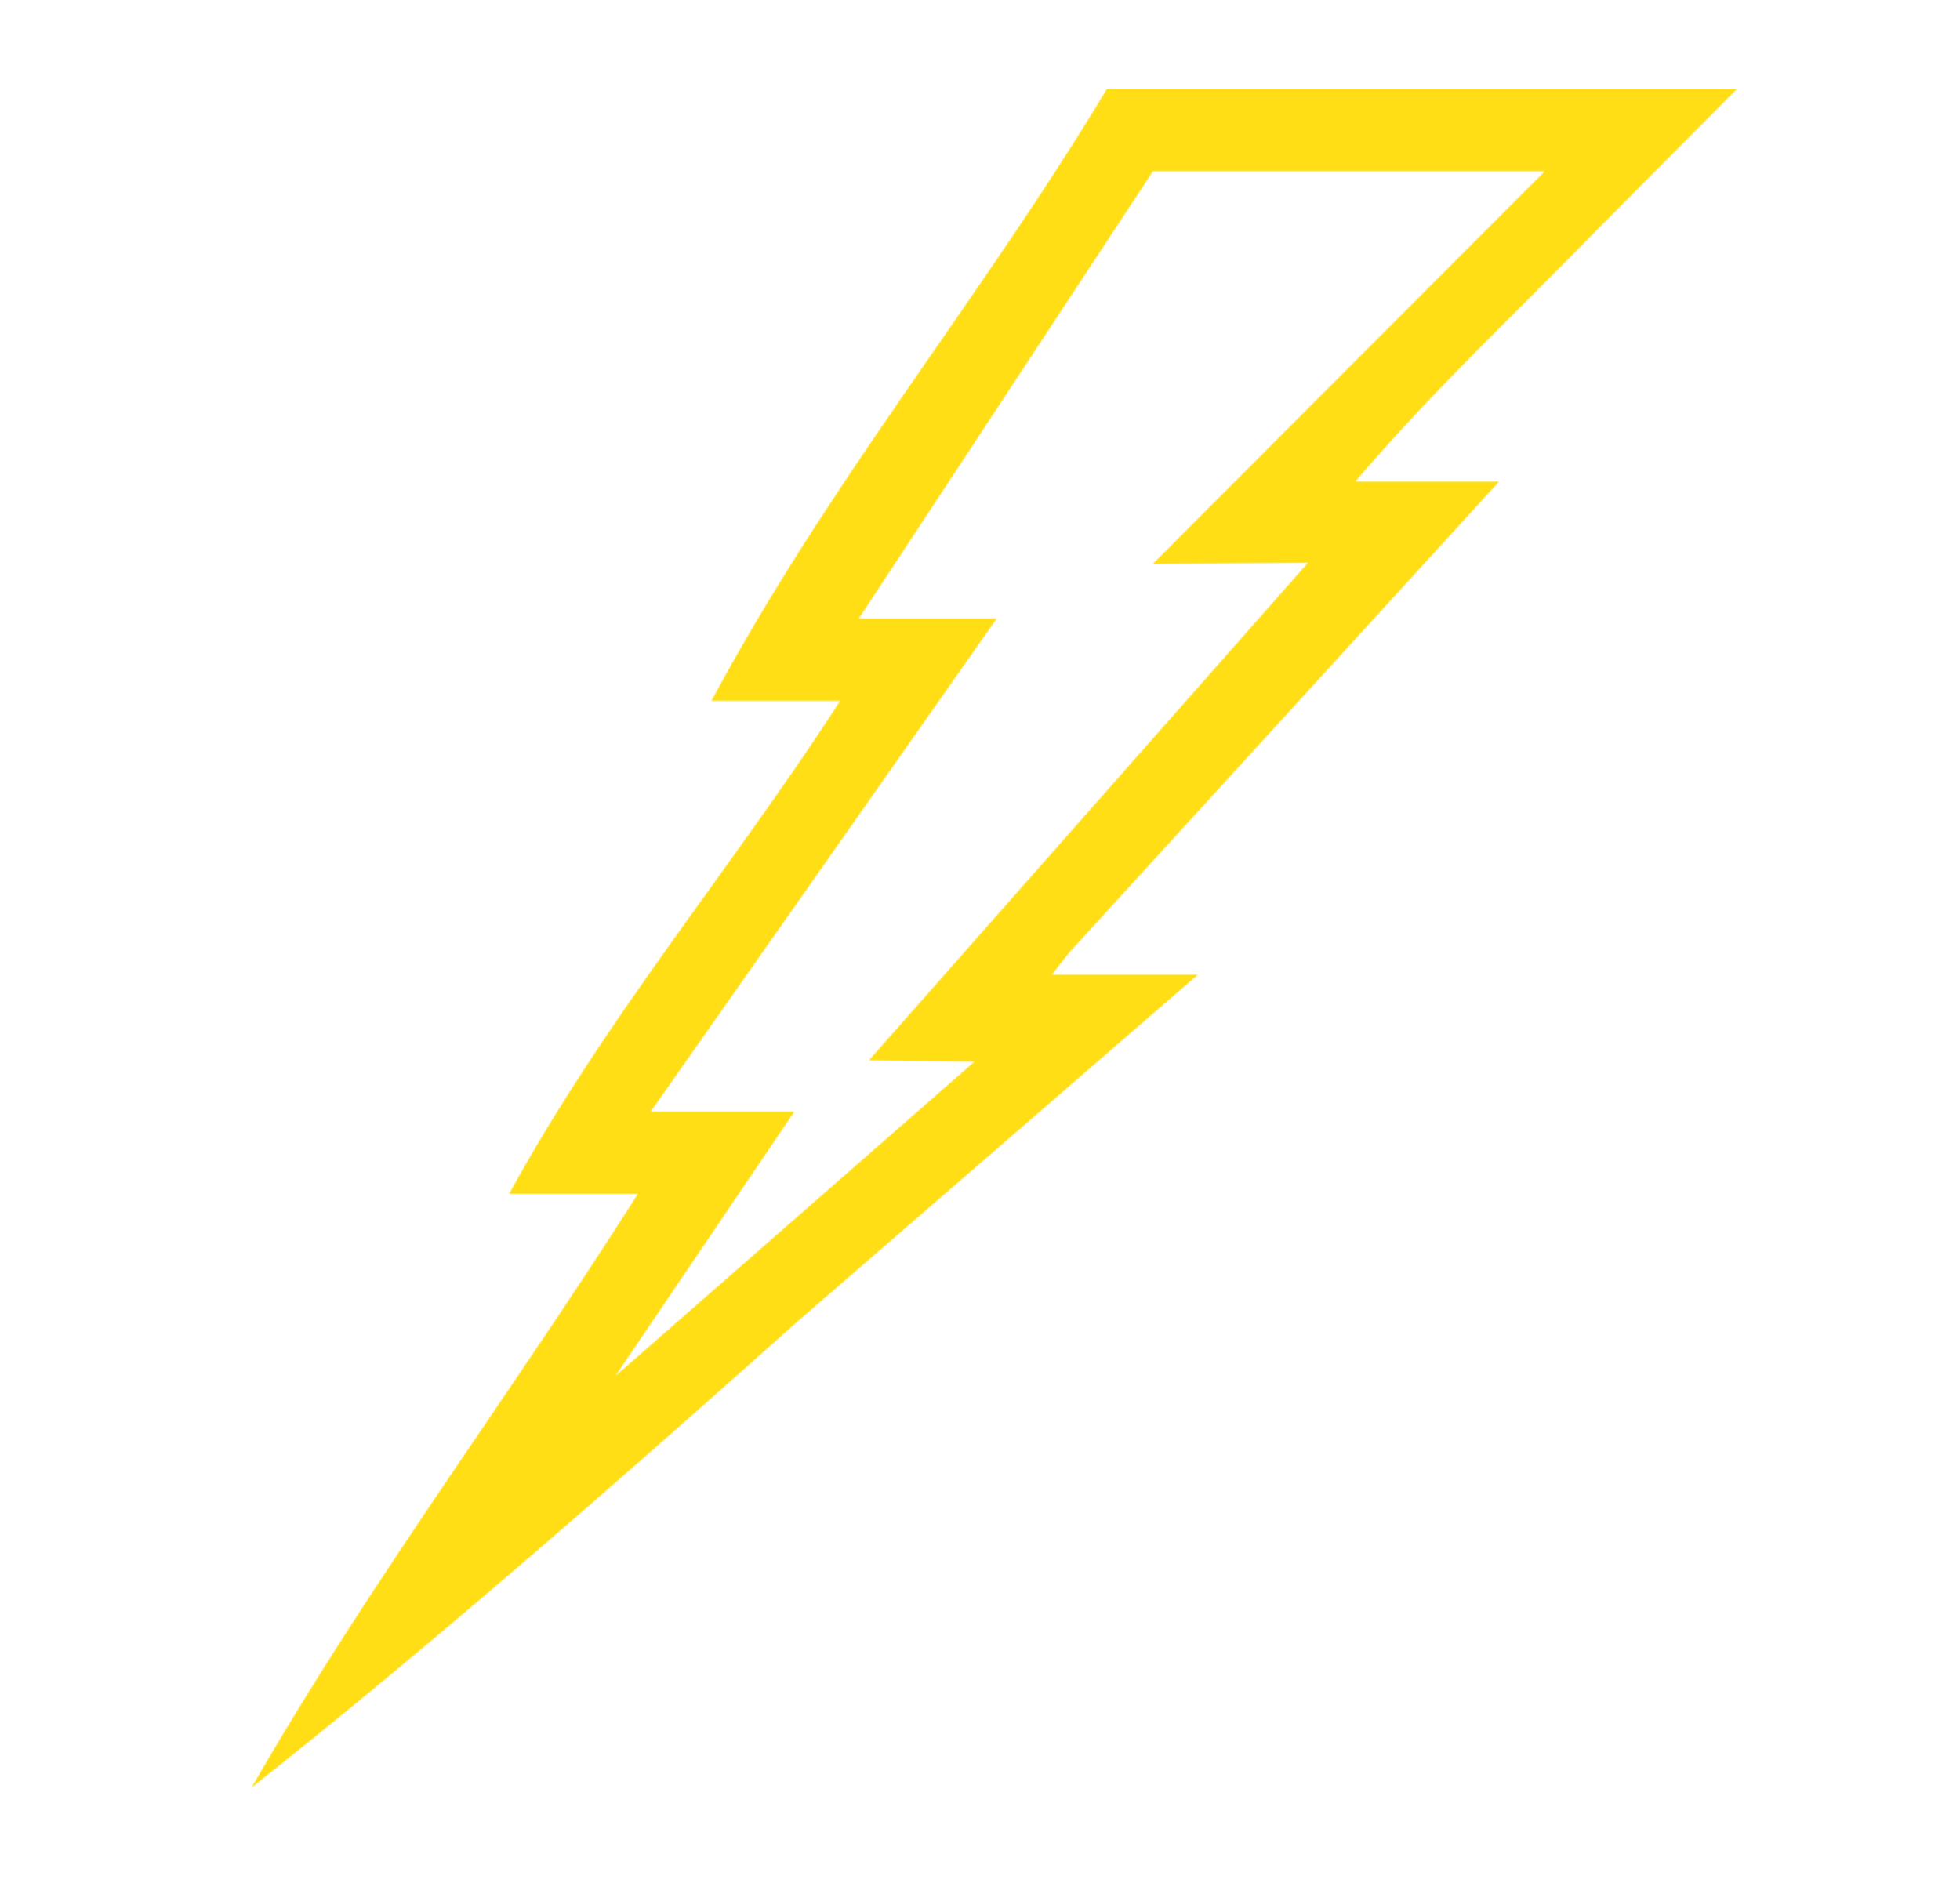 Lightning Bolt Bolt Clipart 7 Lighting B-Lightning bolt bolt clipart 7 lighting bolt french bathroom-10